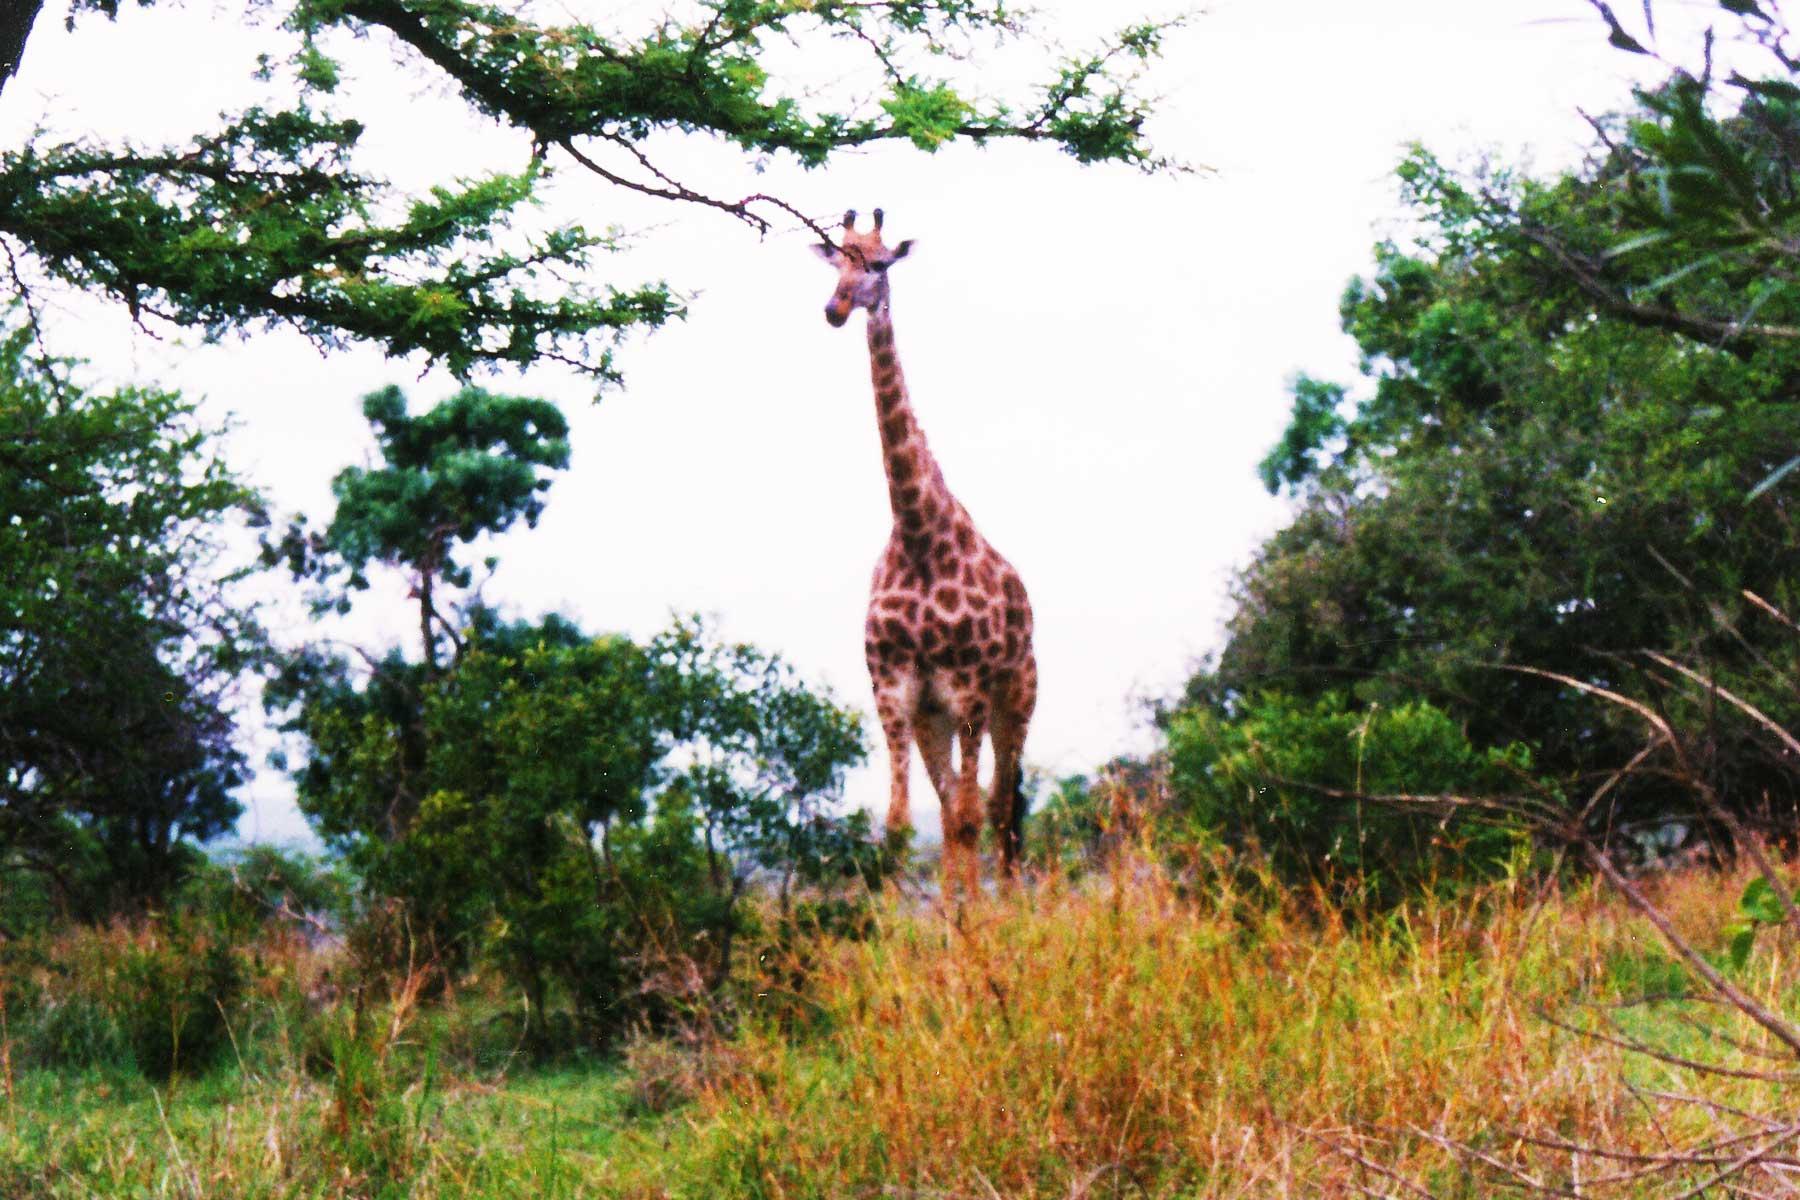 Giraffe - Hluhluwe-Umfolozi Game Reserve - Steven Andrew Martin - South Africa Photo Journal - international education online